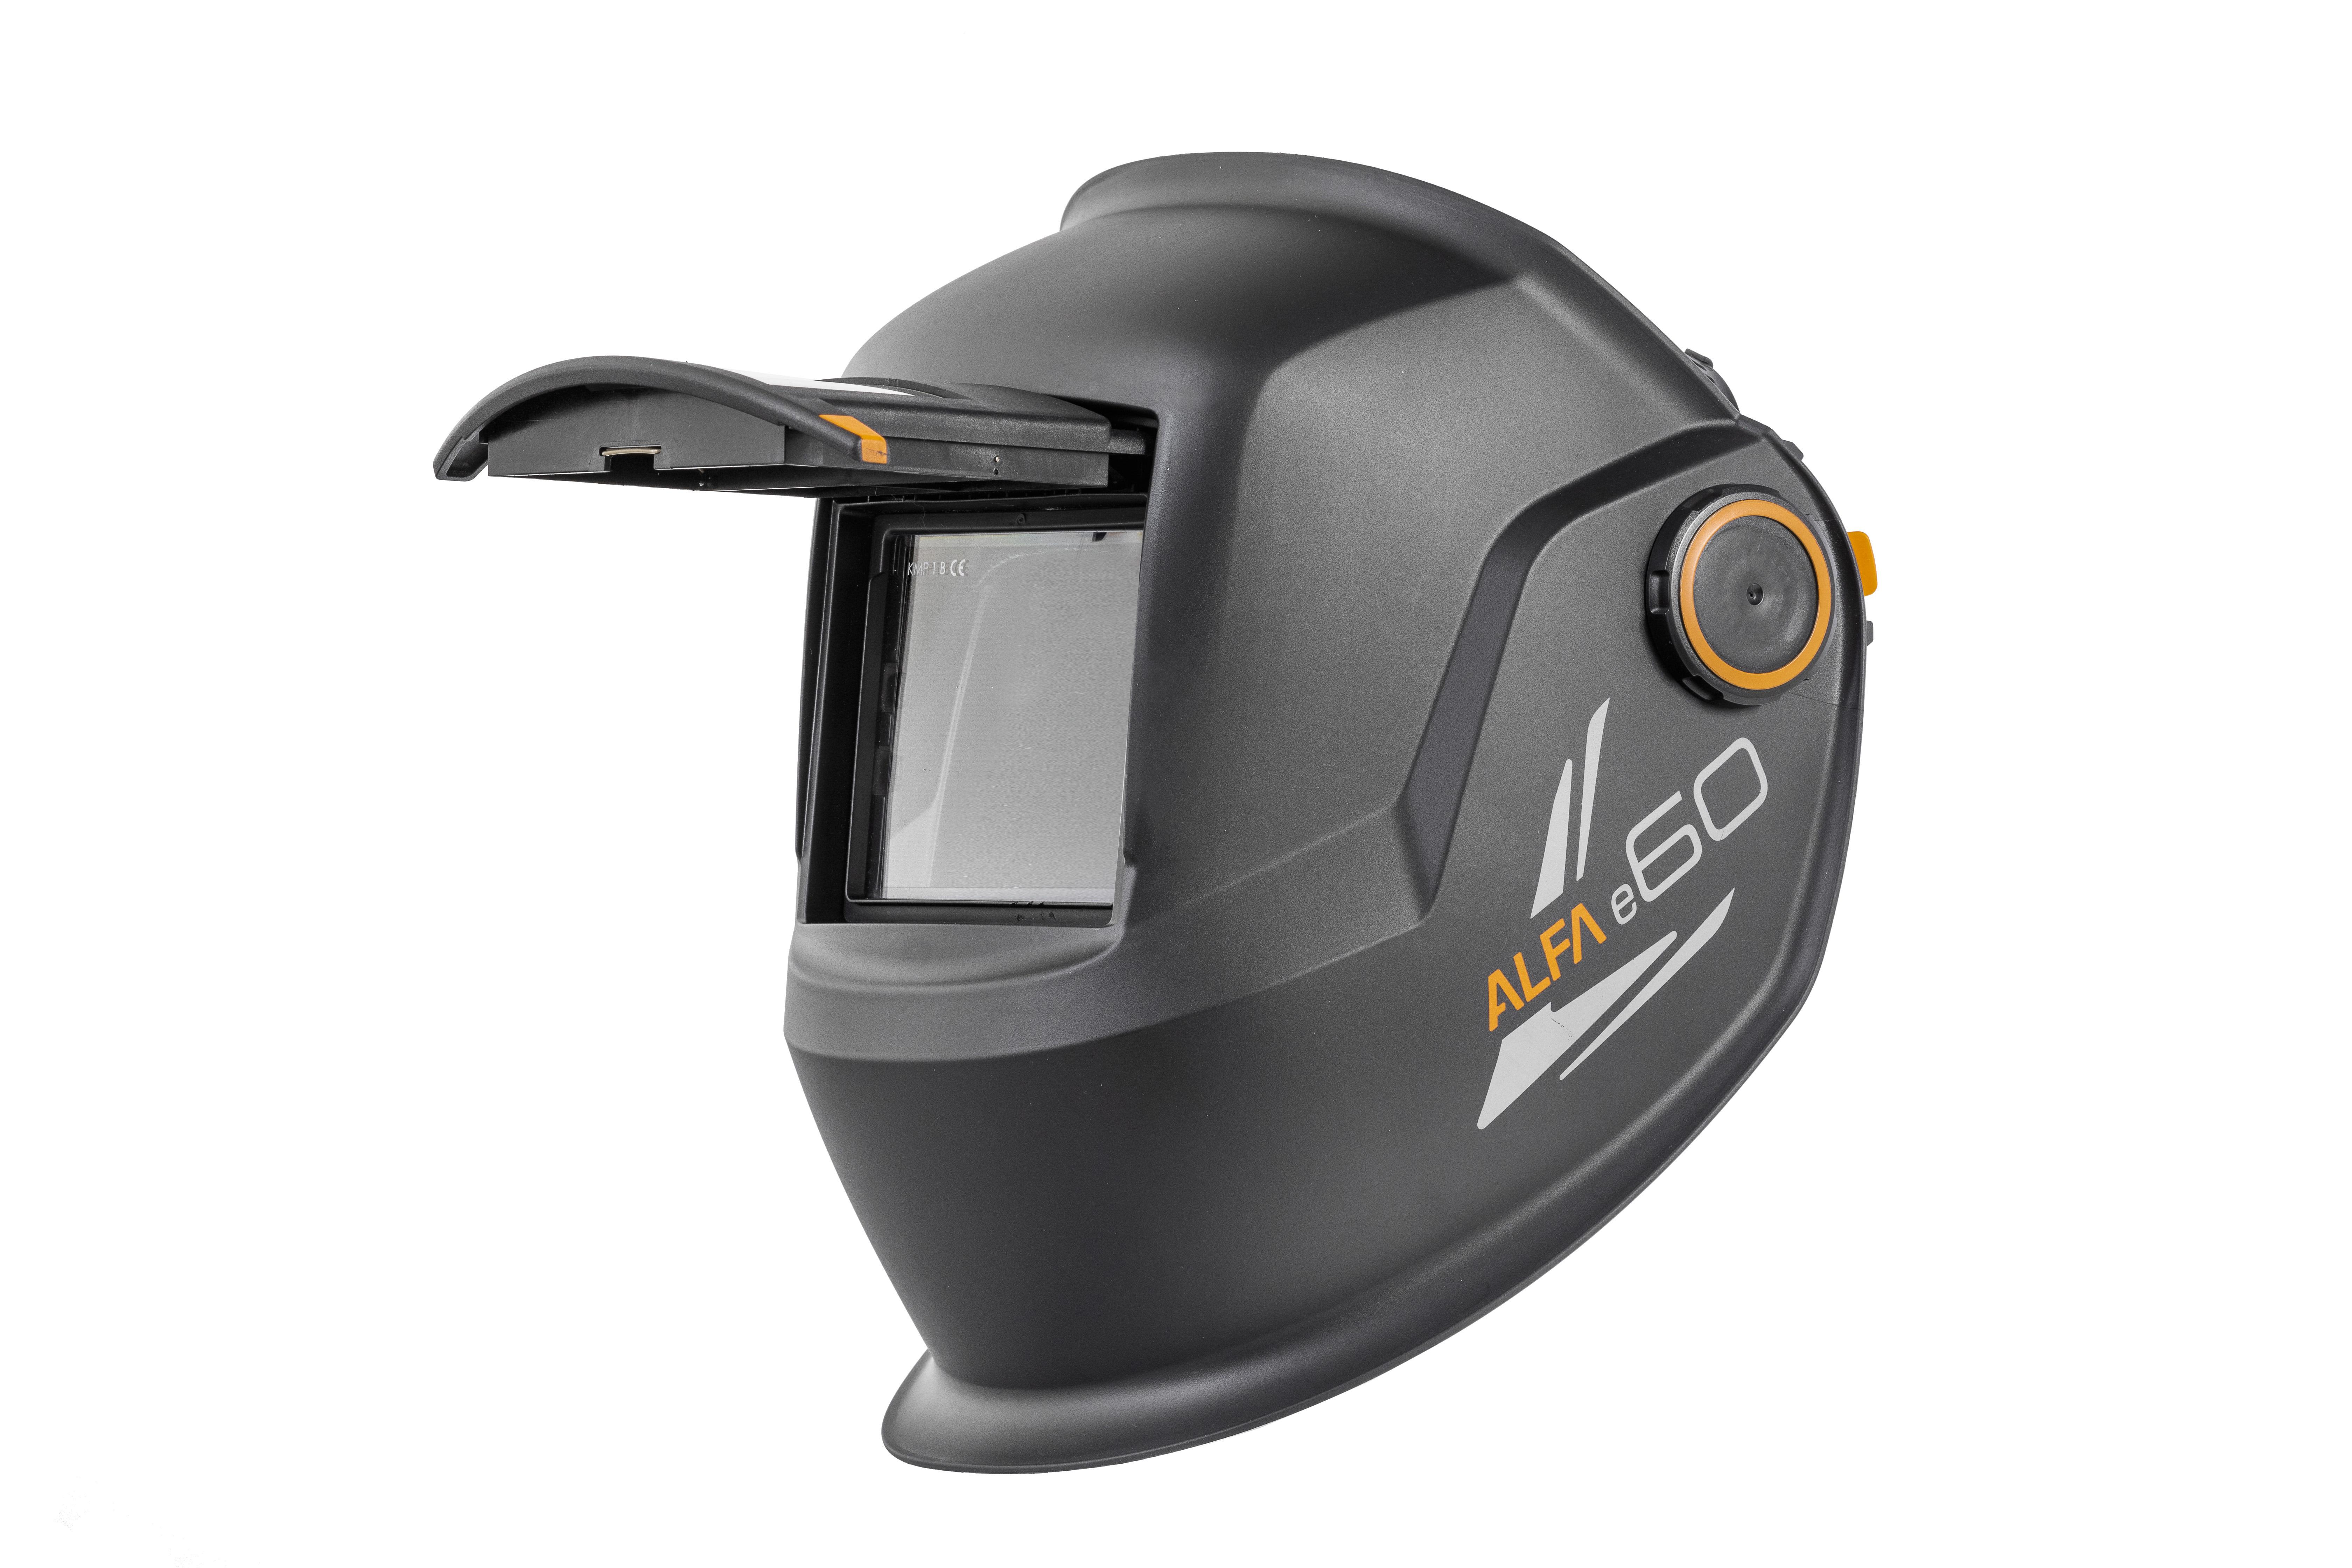 Сварочная маска Kemppi Alfa e60a (9873021) сварочная маска kemppi beta e90p 9873022